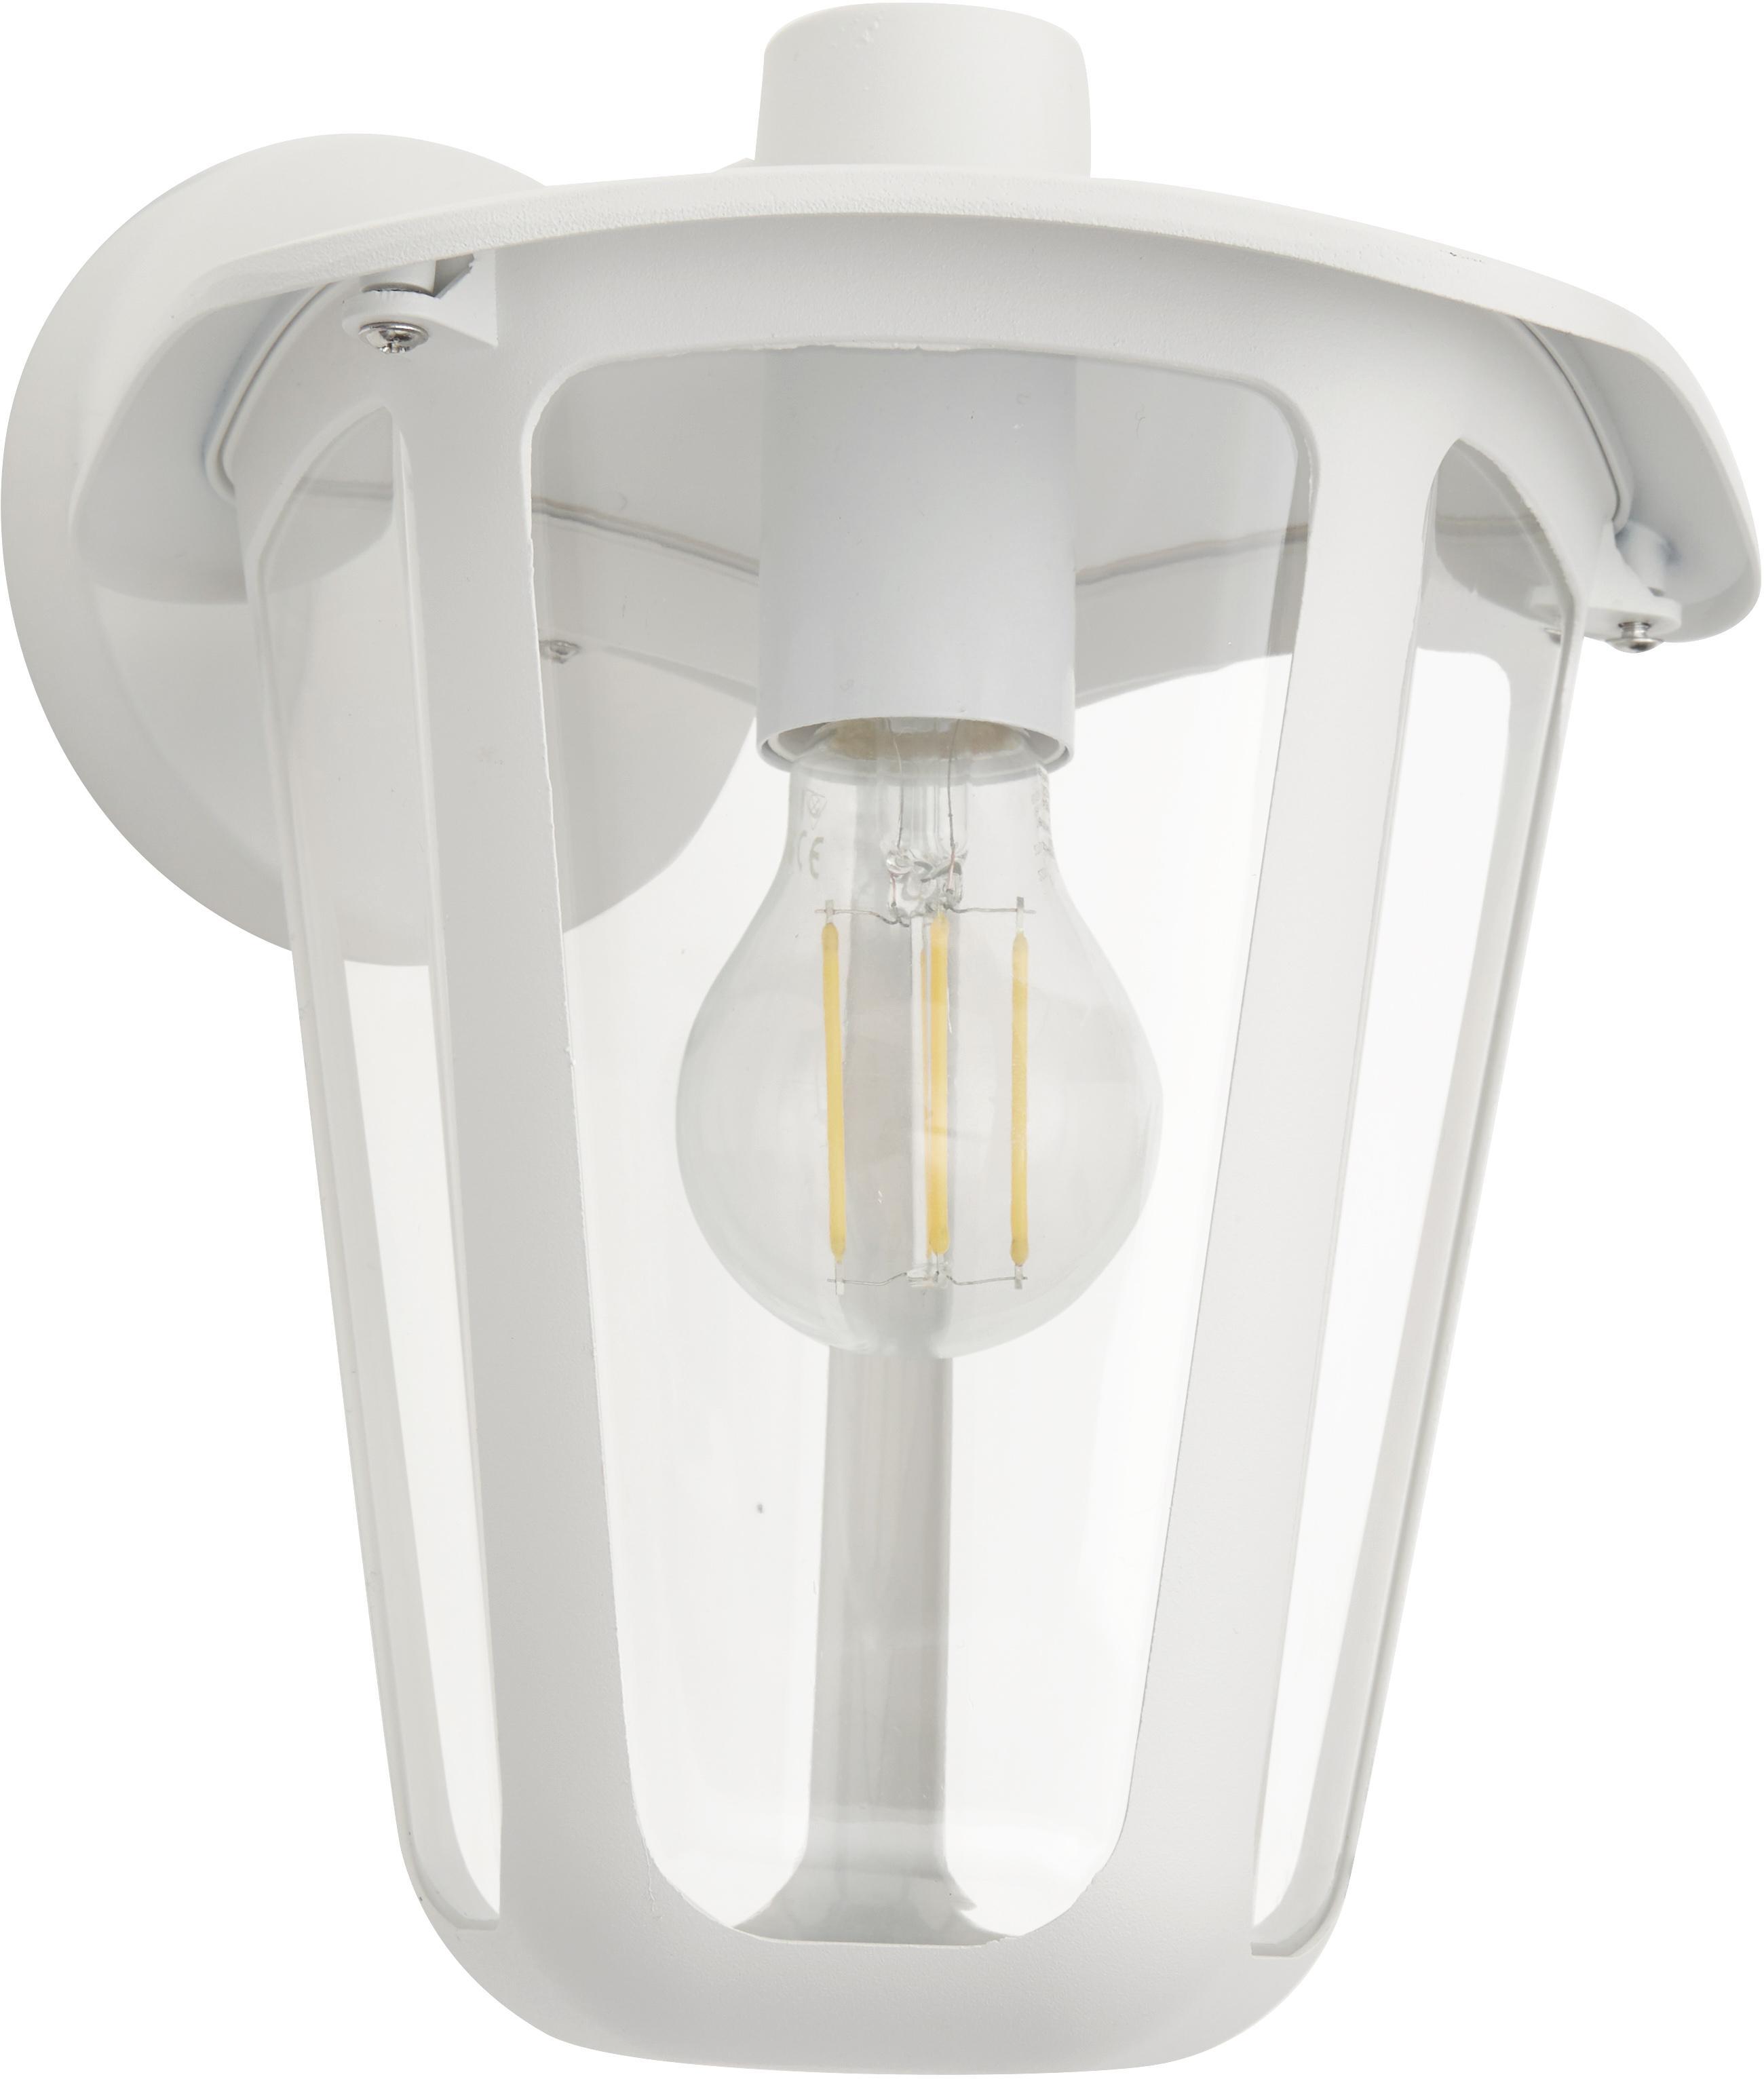 Aussenwandleuchte Monreale in Weiss, Gehäuse: Aluminium, Lampenschirm: Kunststoff, Weiss, 23 x 28 cm